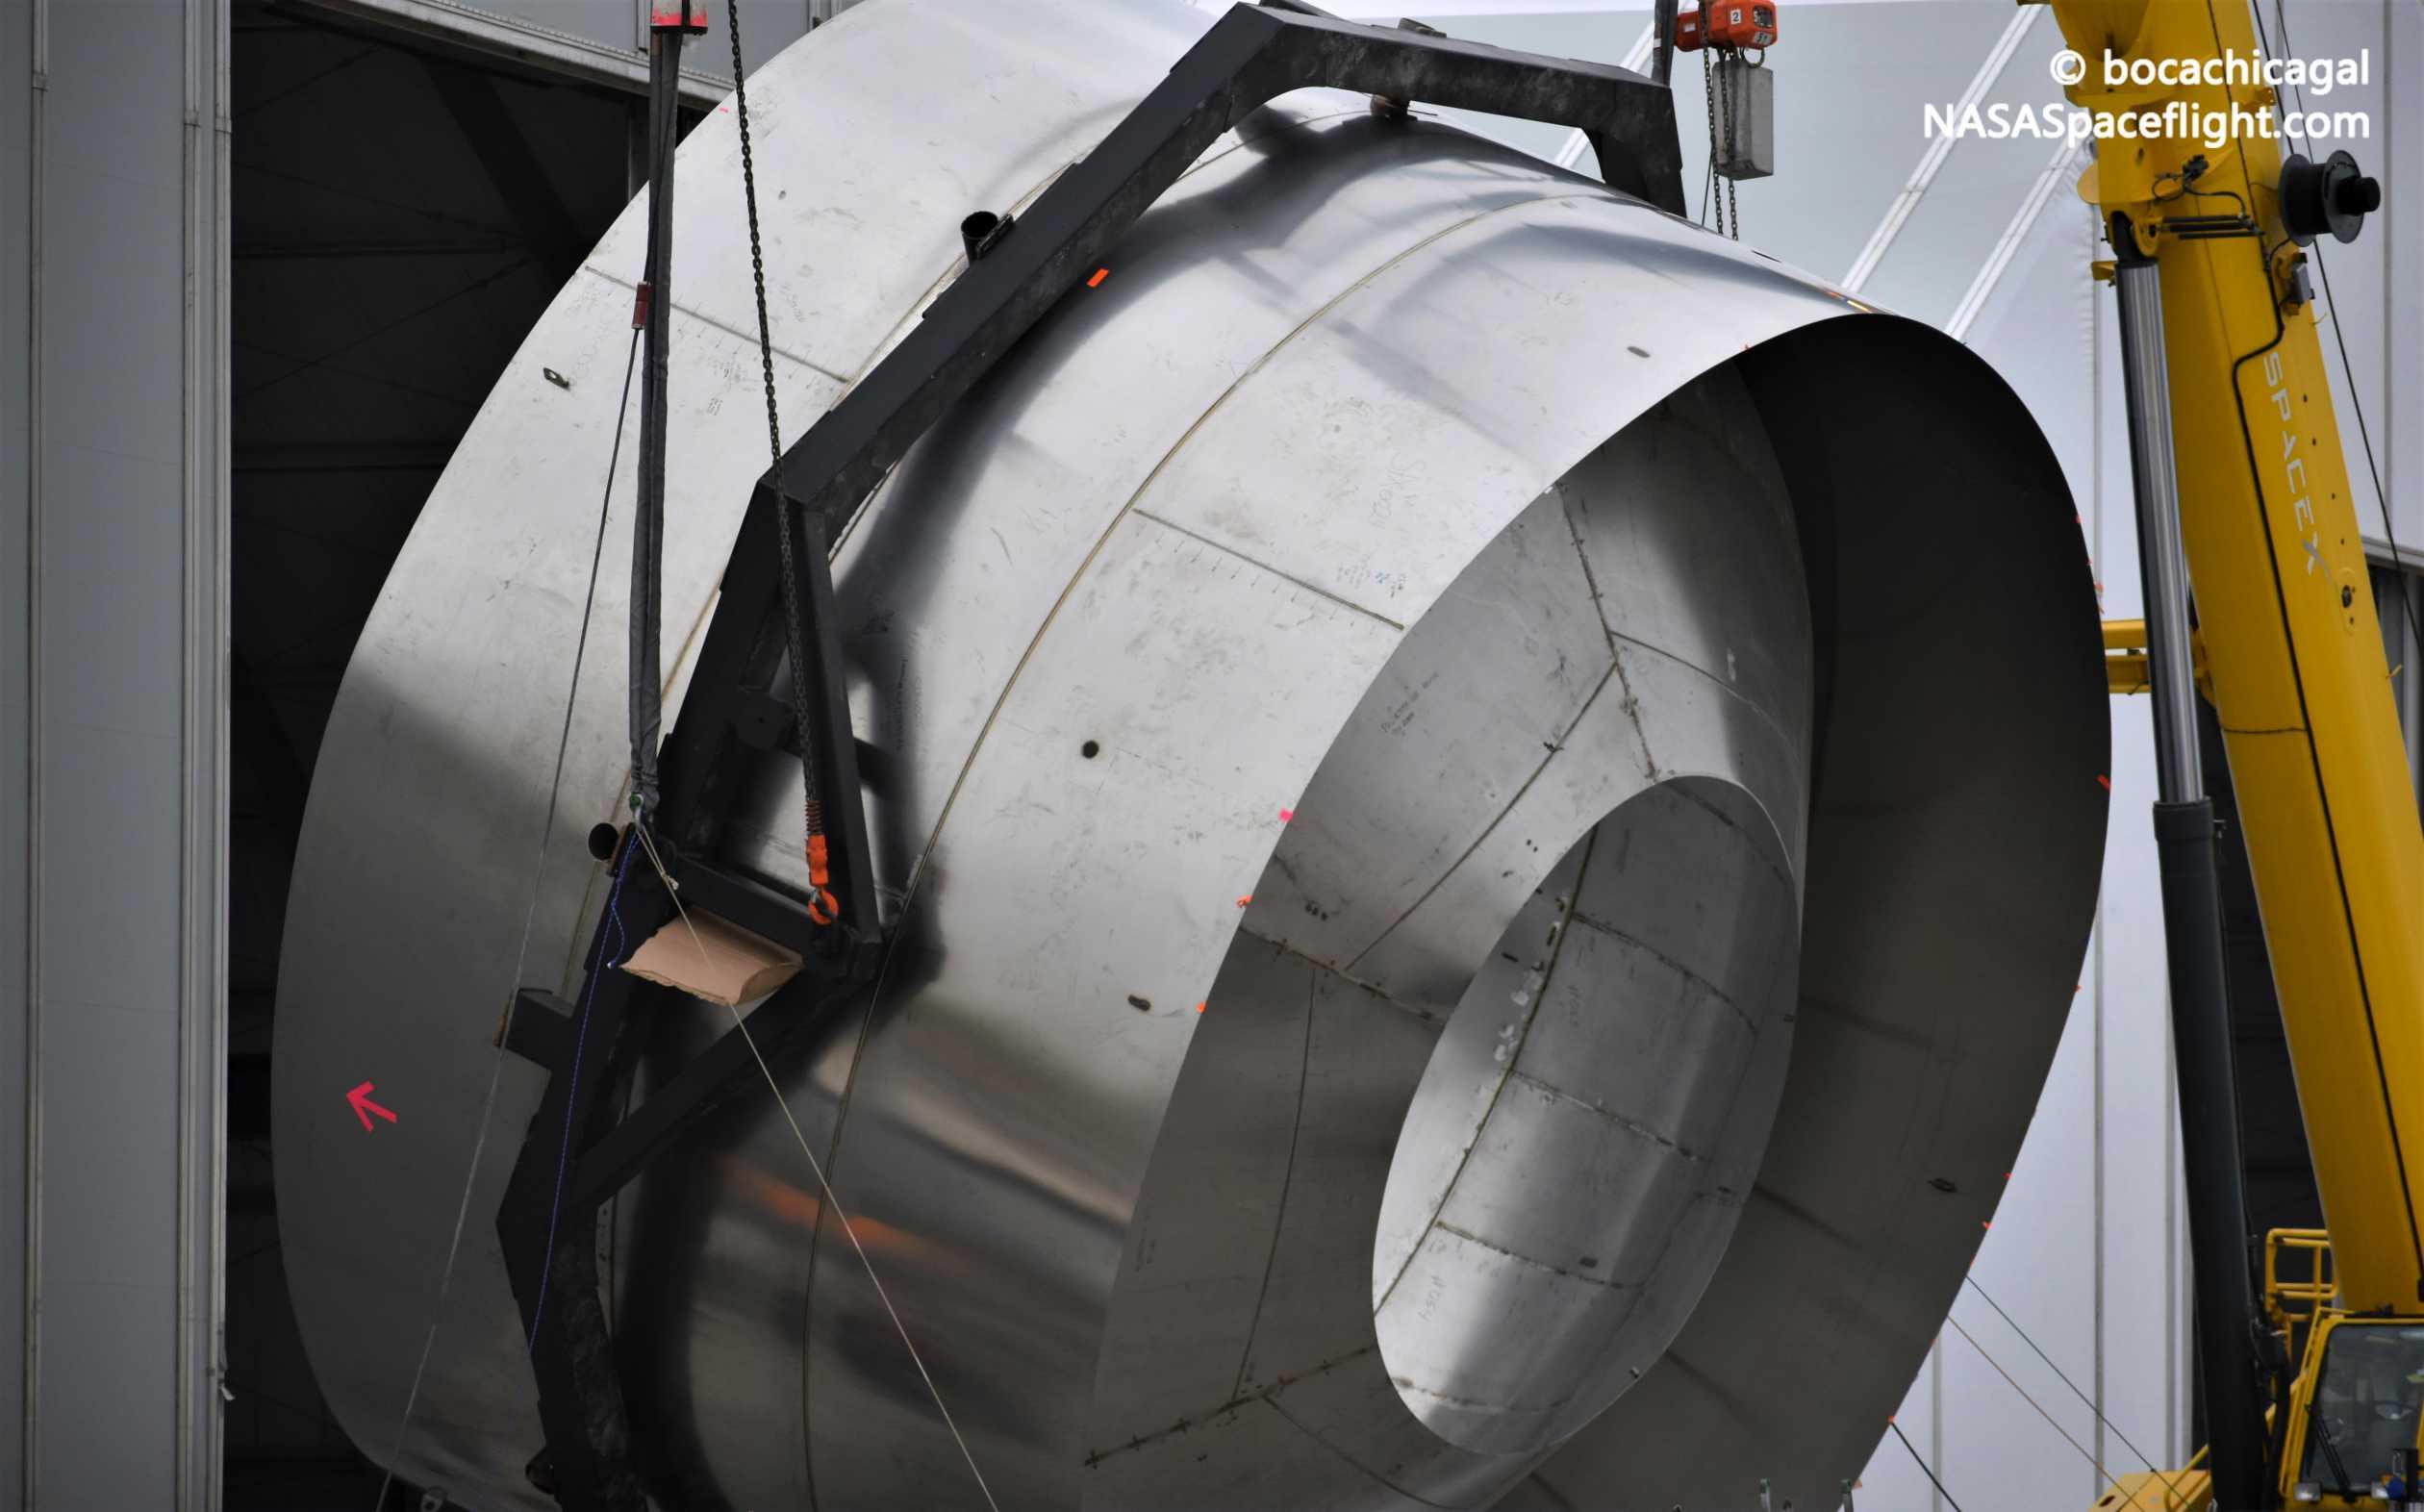 Starship Boca Chica 020920 (NASASpaceflight – bocachicagal) SN01 dome ring flip 4 crop (c)